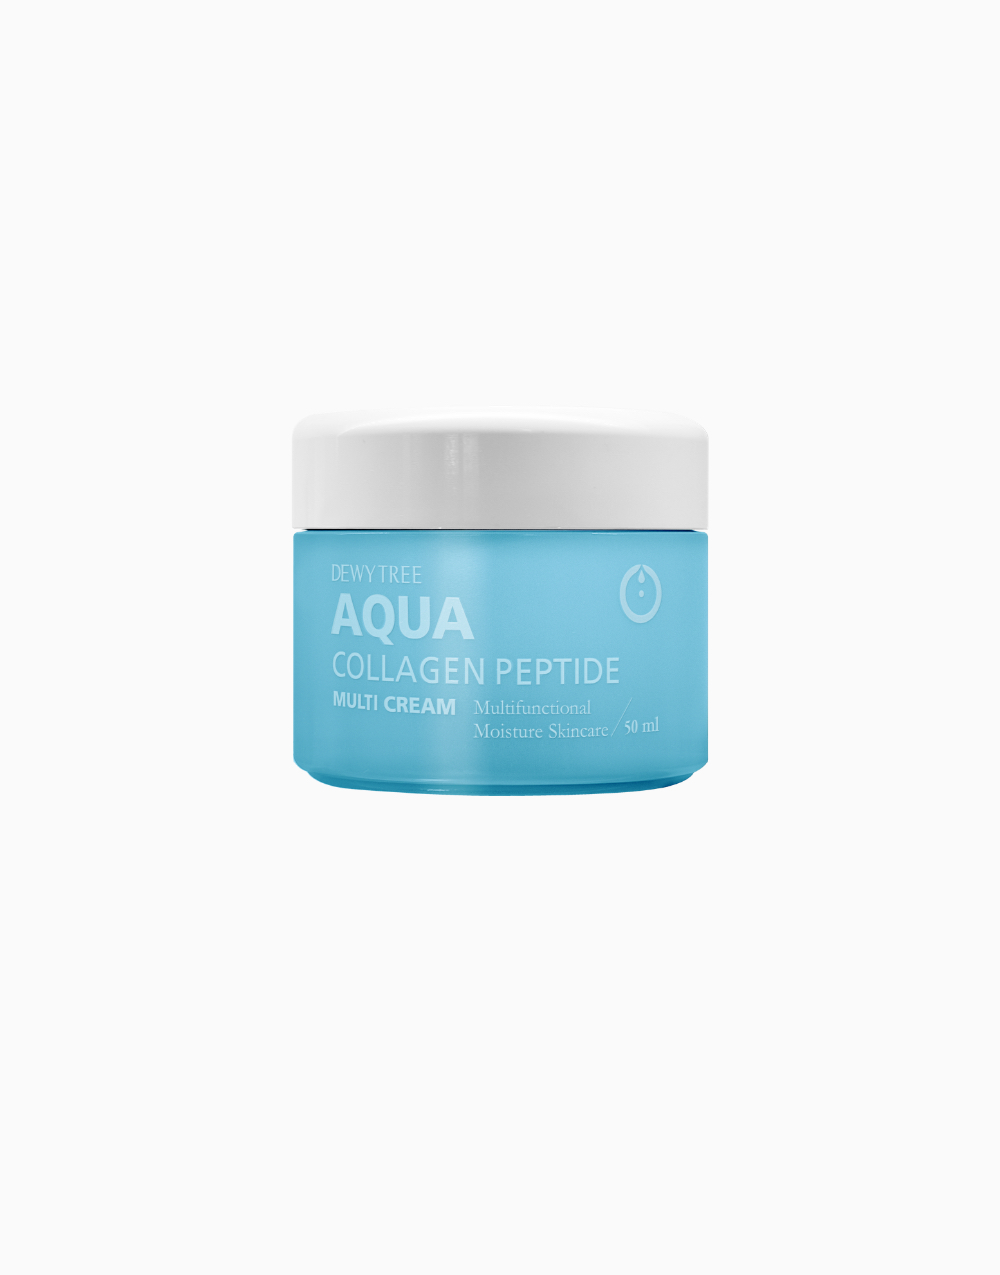 Aqua Collagen Peptide Multi Cream 50 ml by Dewytree